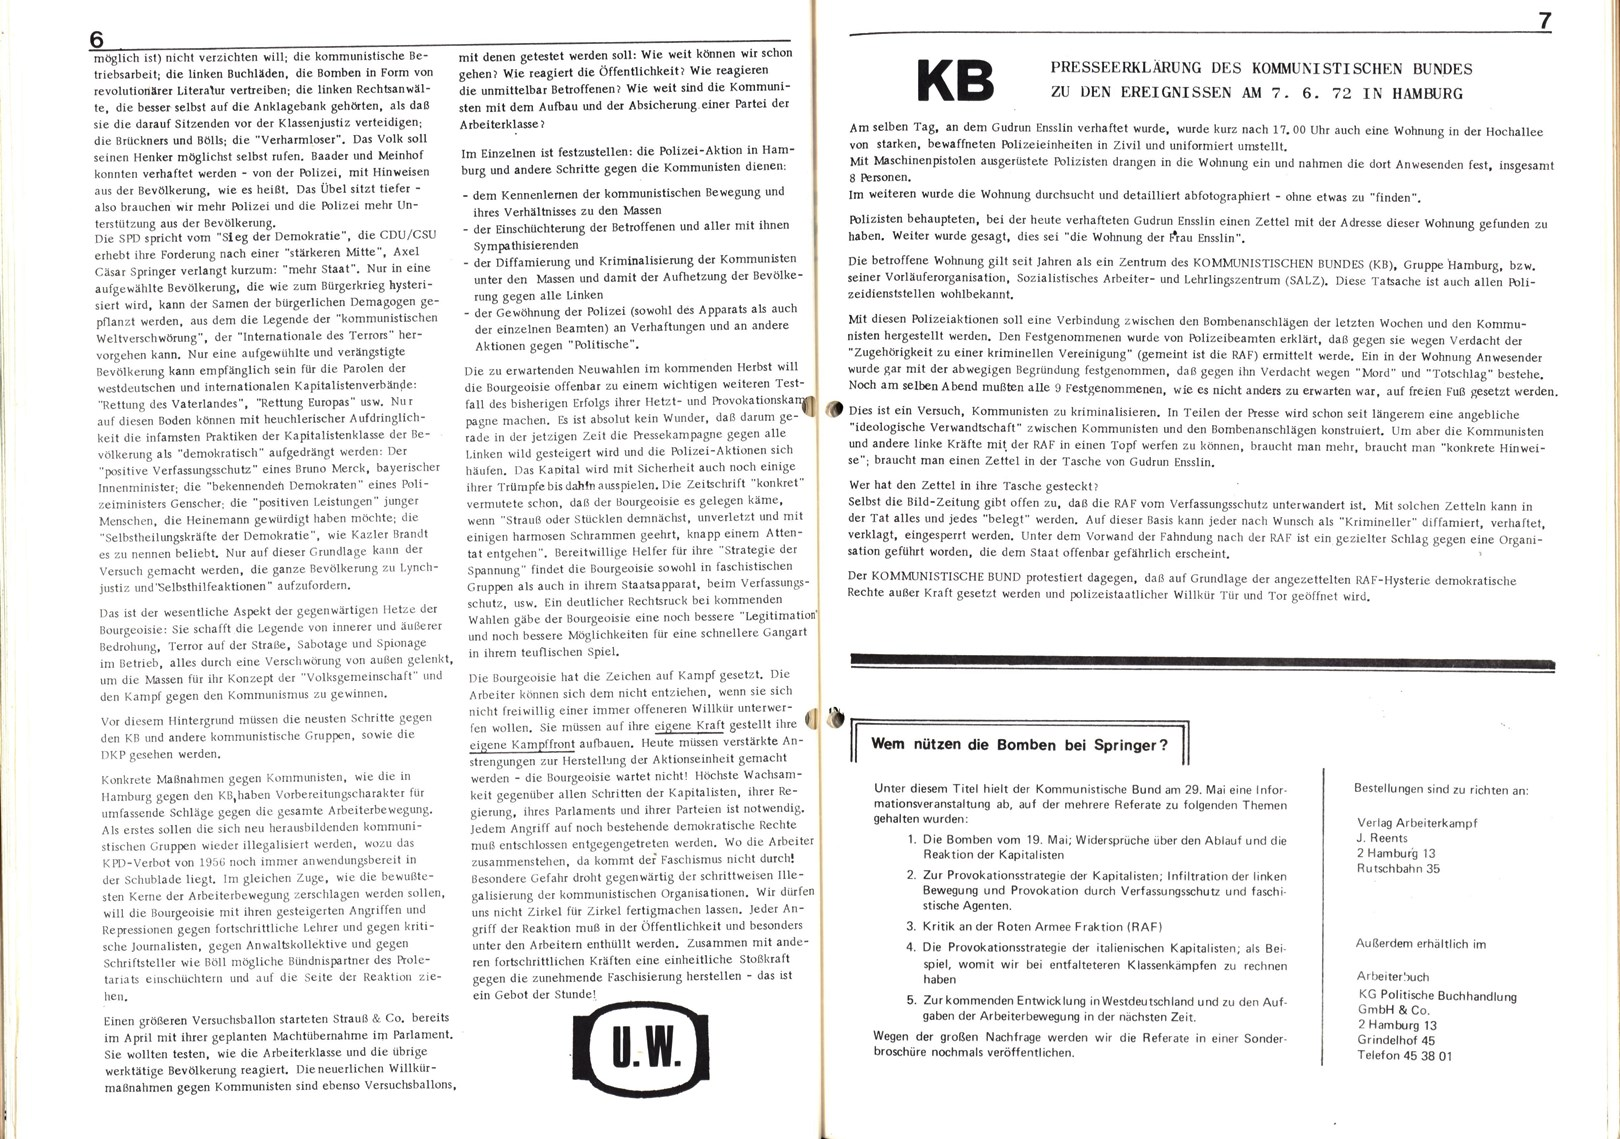 KB_Unser_Weg_19720600_Sonder1_04